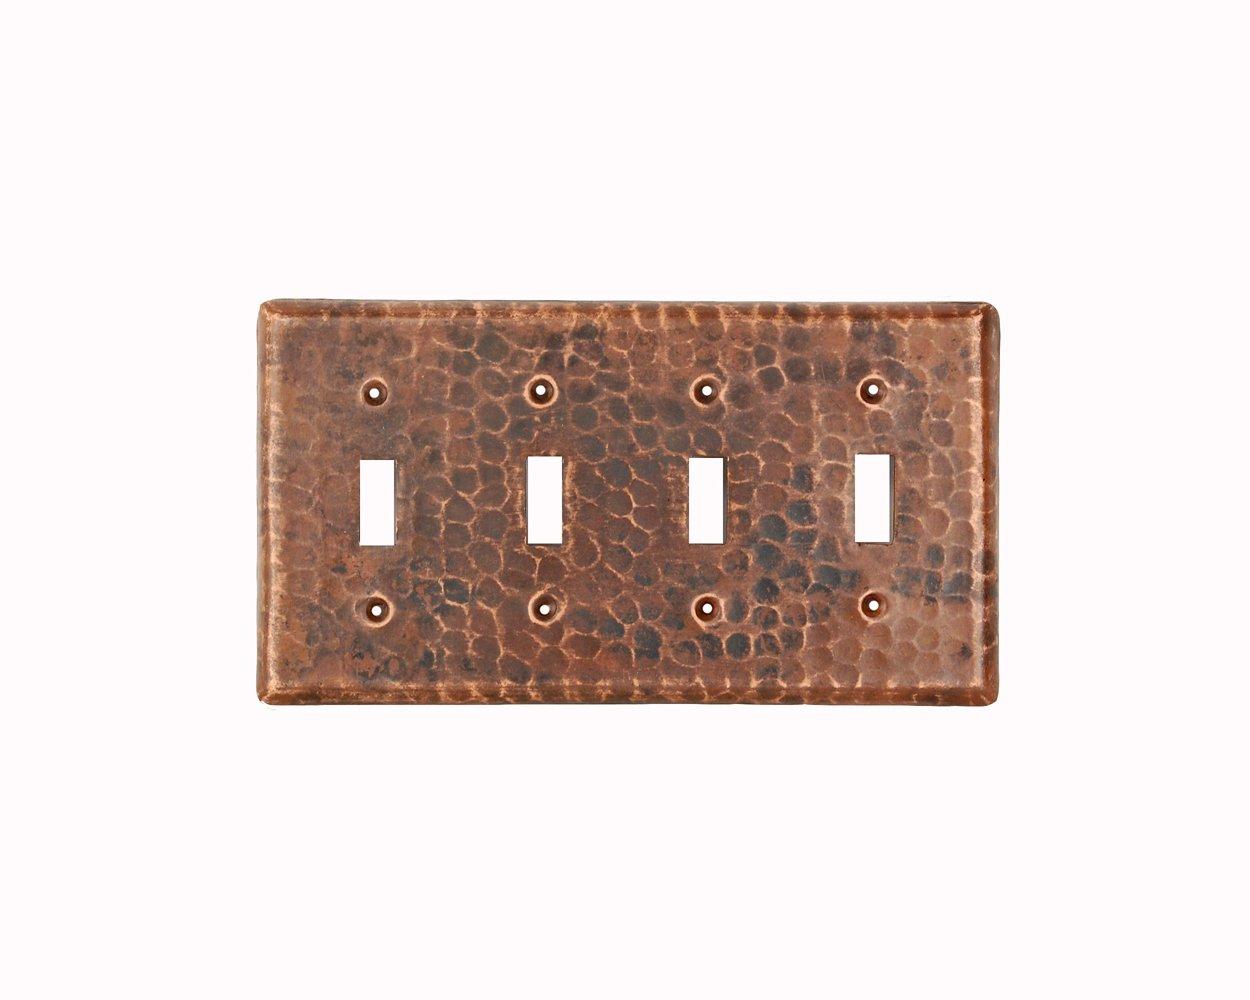 Premier Copper Products ST4 Copper Switch Plate Quadruple Toggle Switch Cover, Oil Rubbed Bronze